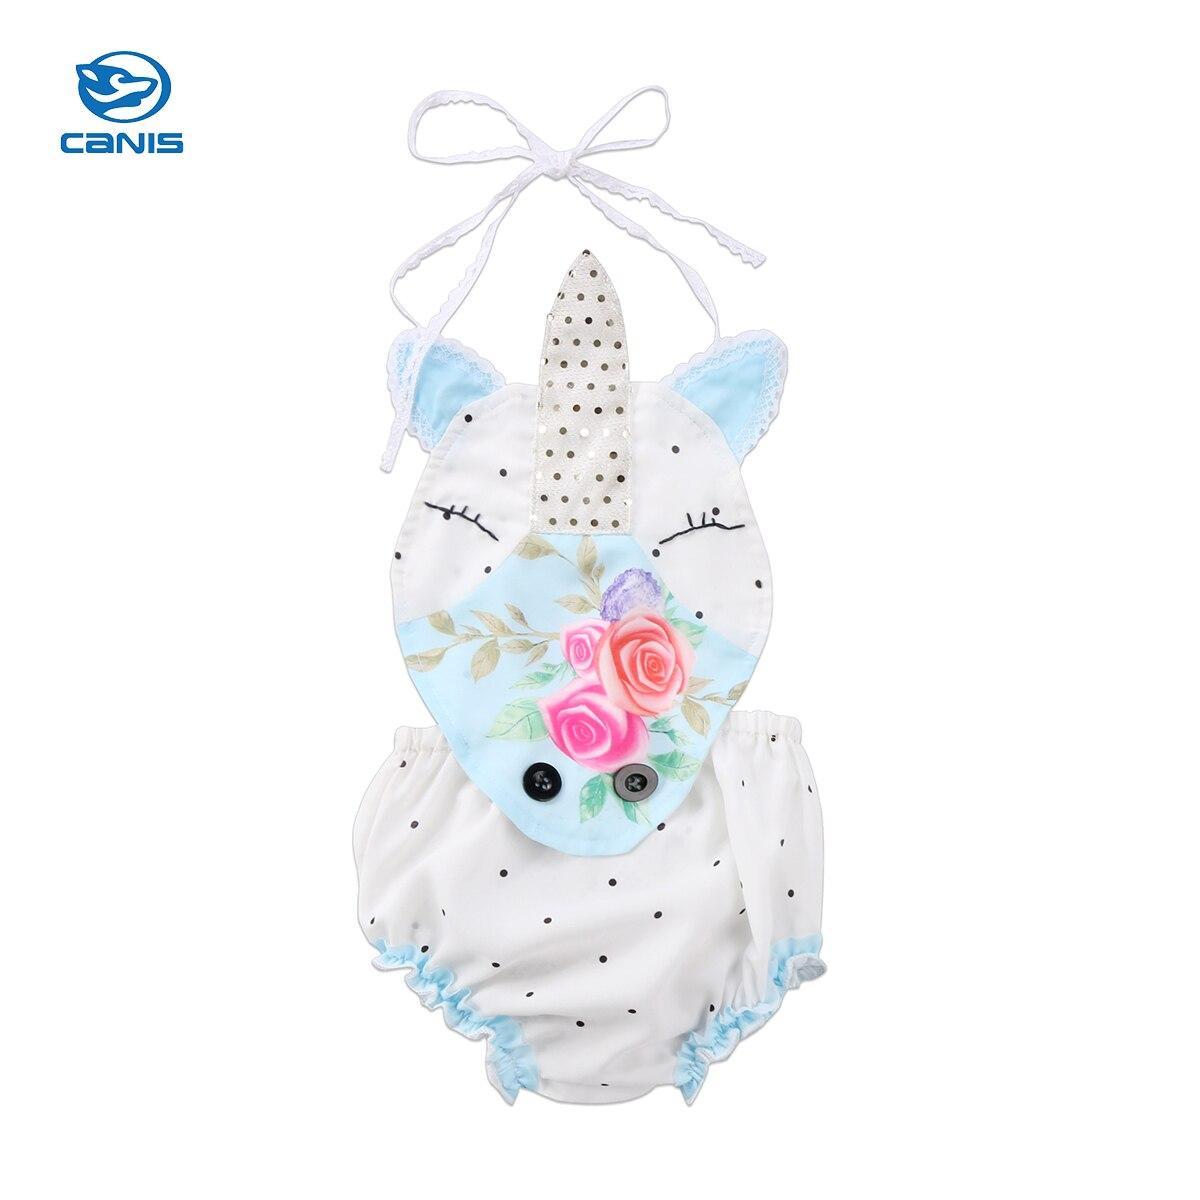 Baby Clothing Newborn Baby Girl Unicorn Romper Floral Sleeveless Romper Drawstring Romper Jumpsuit Summer Children Clothing